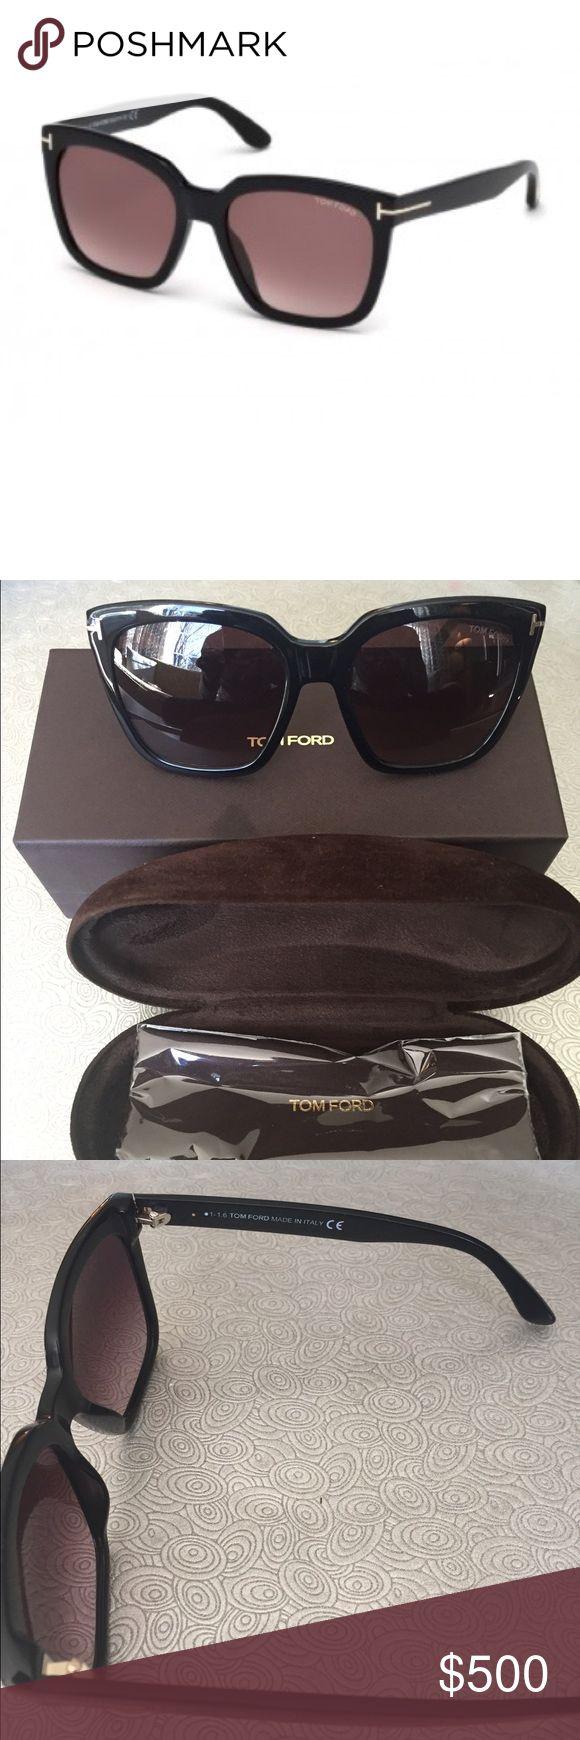 Authentic Tom Ford Sunglasses TOM FORD AMARA!  Specifics: 100% UV PROTECTION. Original DESIGNER CASE & CLOTHFREE UK DELIVERY Height49 BrandTom Ford Bridge18 Frame Color: Black GenderWomens Sunglasses ShapeRectangle Temple Length140 Lens: Rectangle Tom Ford Accessories Sunglasses